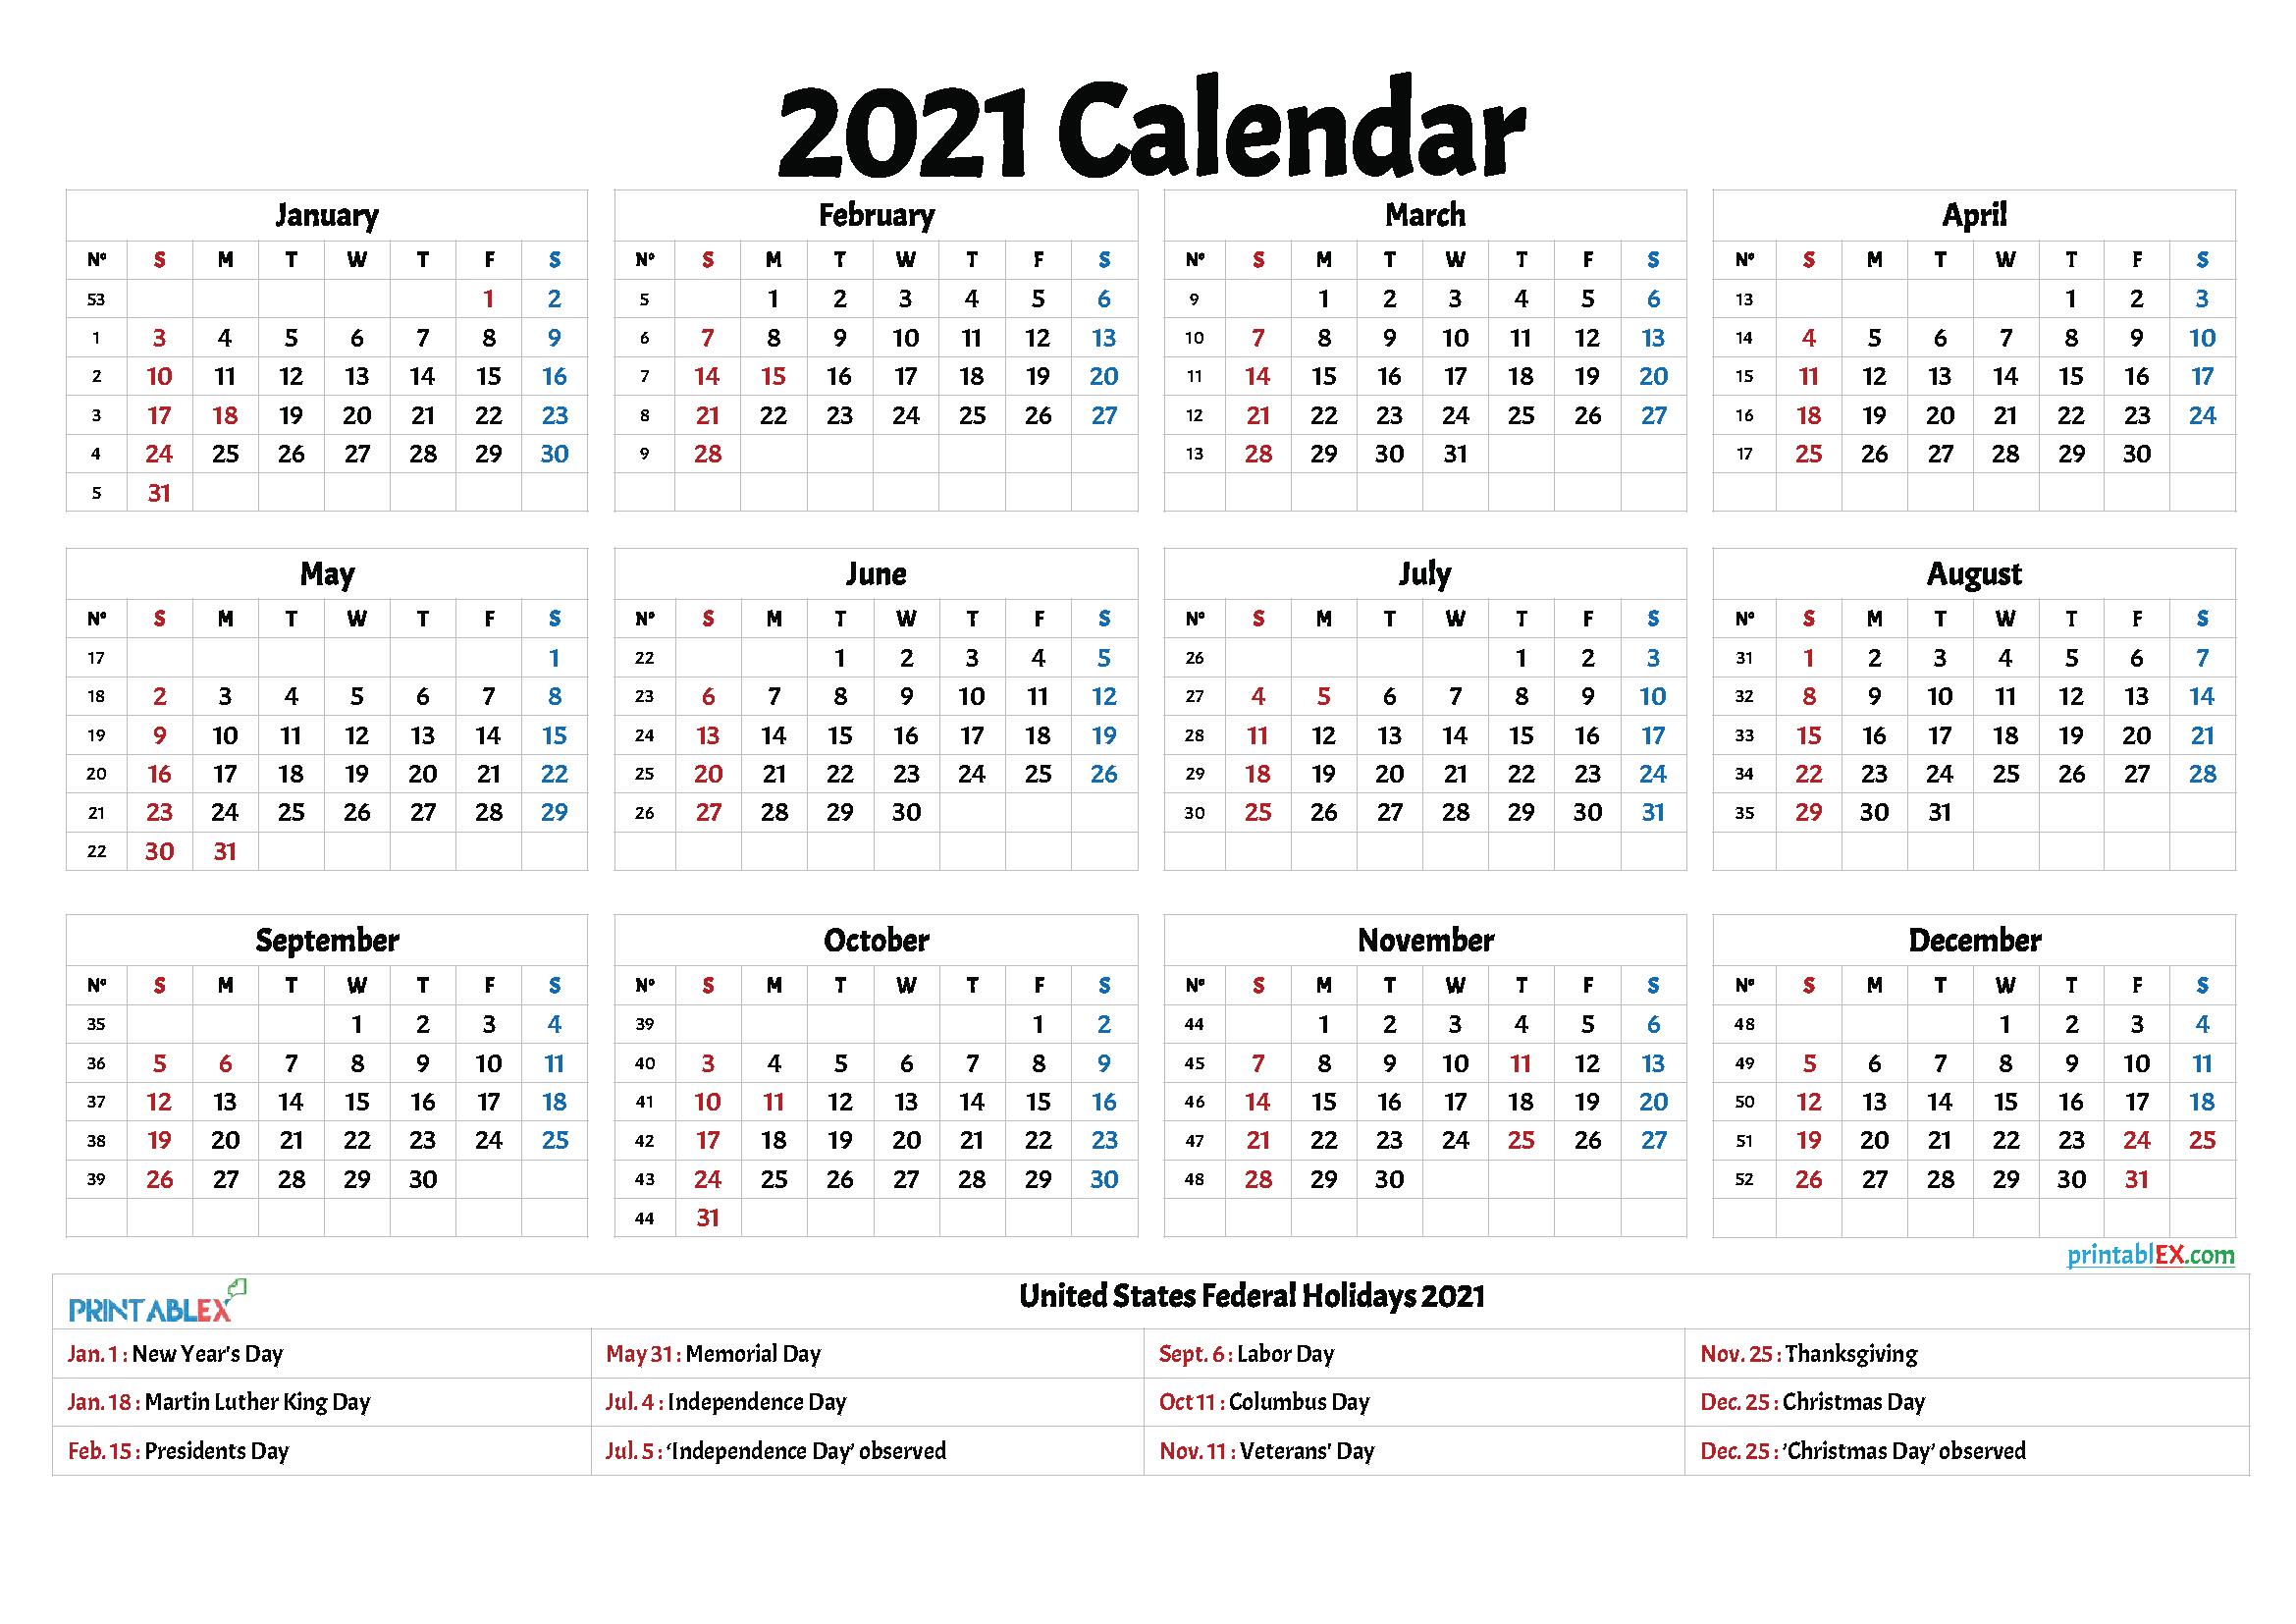 Free 2021 Printable Calendar With Holidays inside Federal Government Calendar Printable